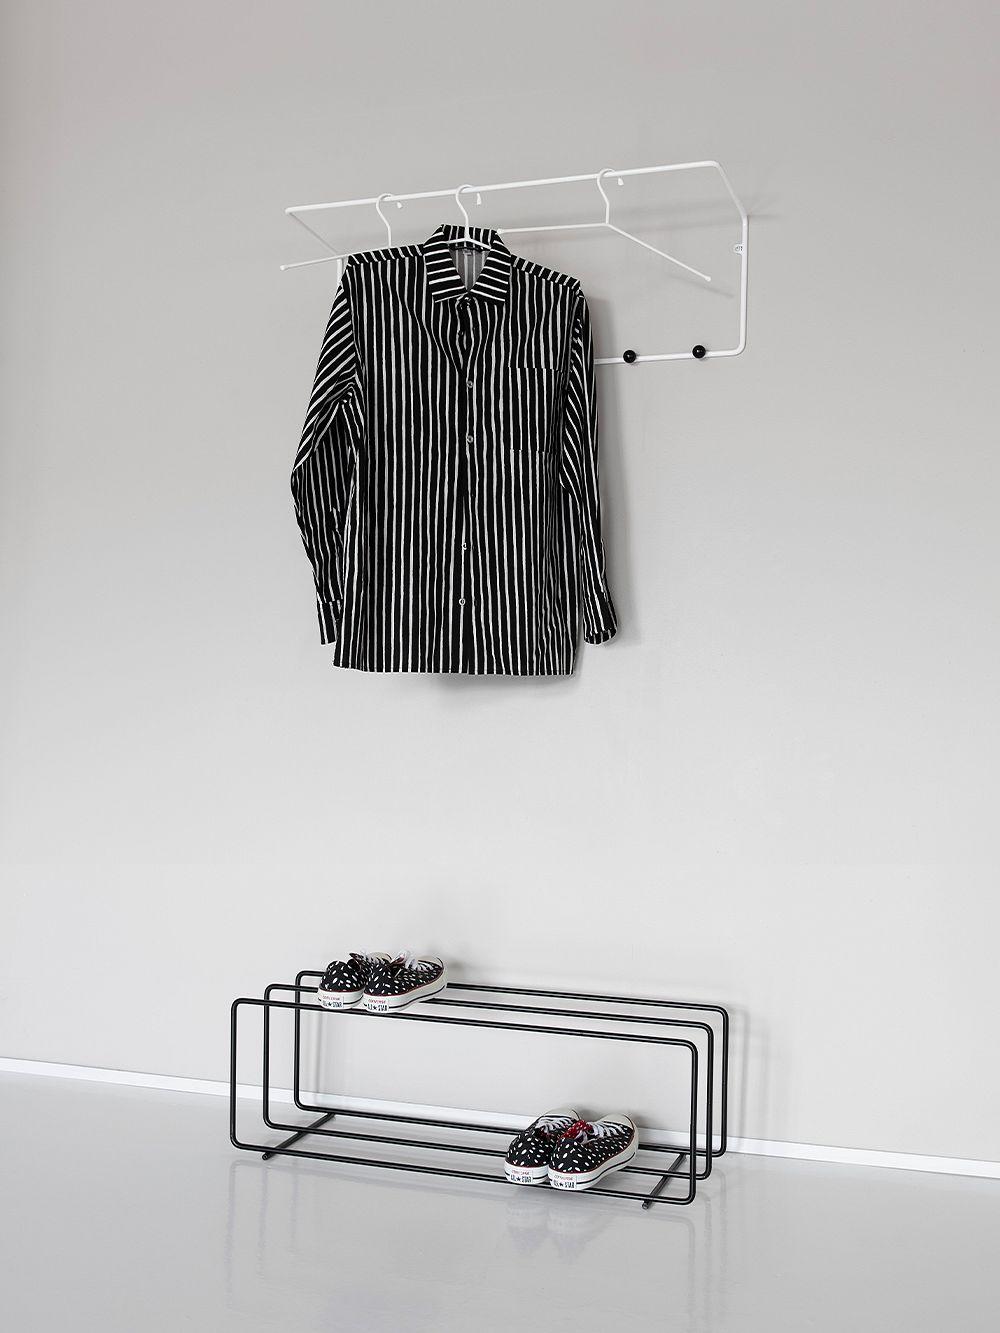 Showroom Finland: Mixrack shoe rack